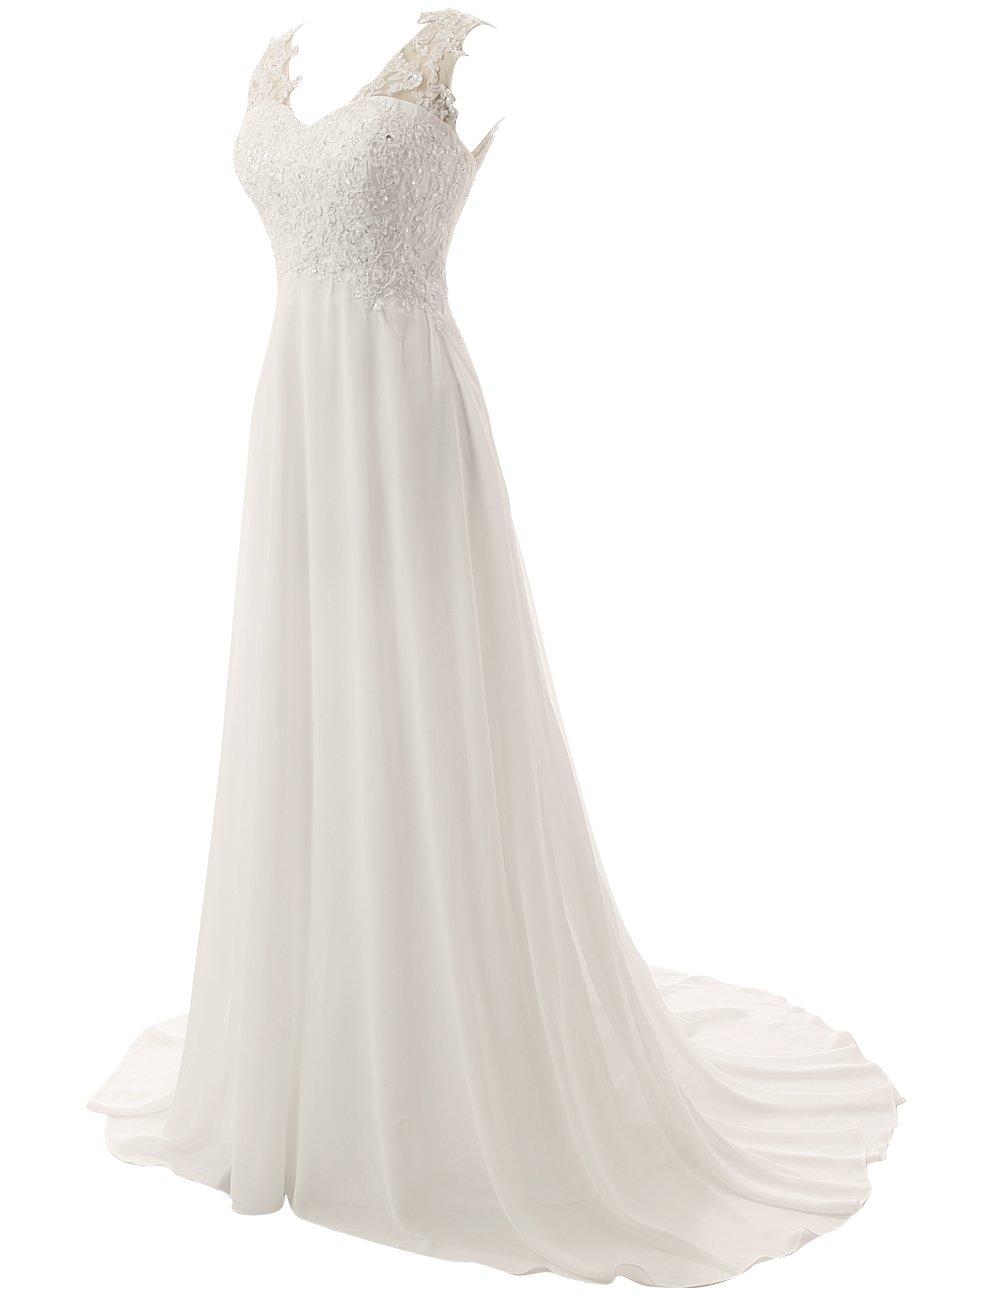 JAEDEN Elegant Lace Beach Wedding Dresses Chiffon V Neck A Line Long Bridal Gown White US22W by JAEDEN (Image #3)